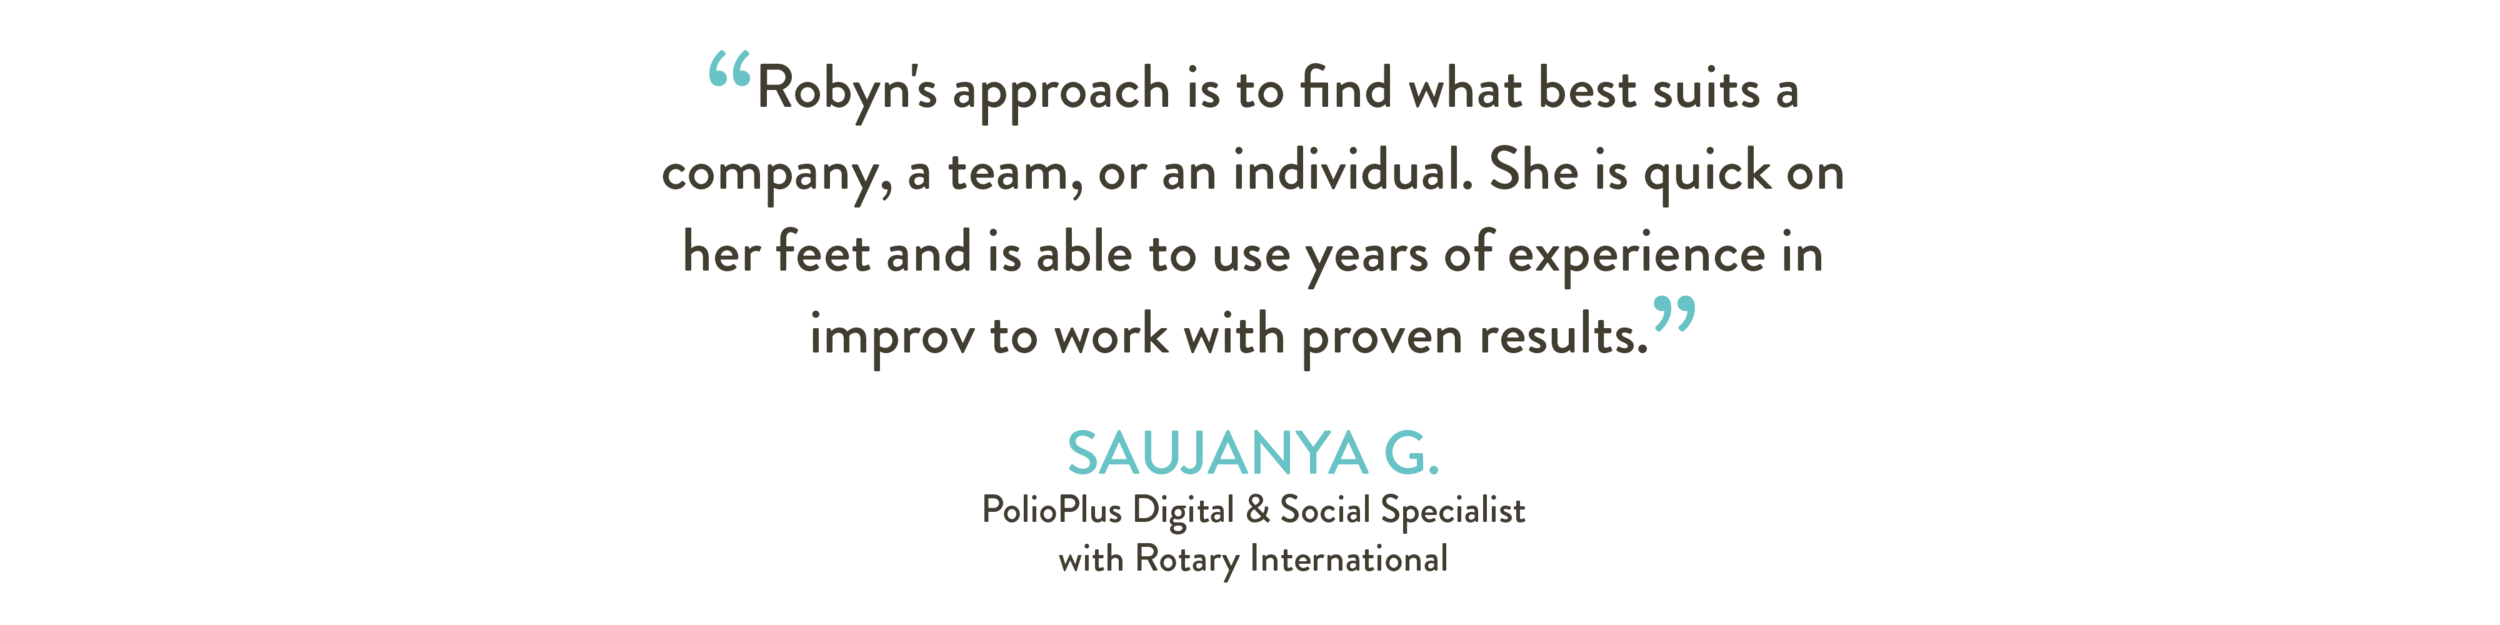 RLS_Testimonials_Speaker_Saujanya G.png